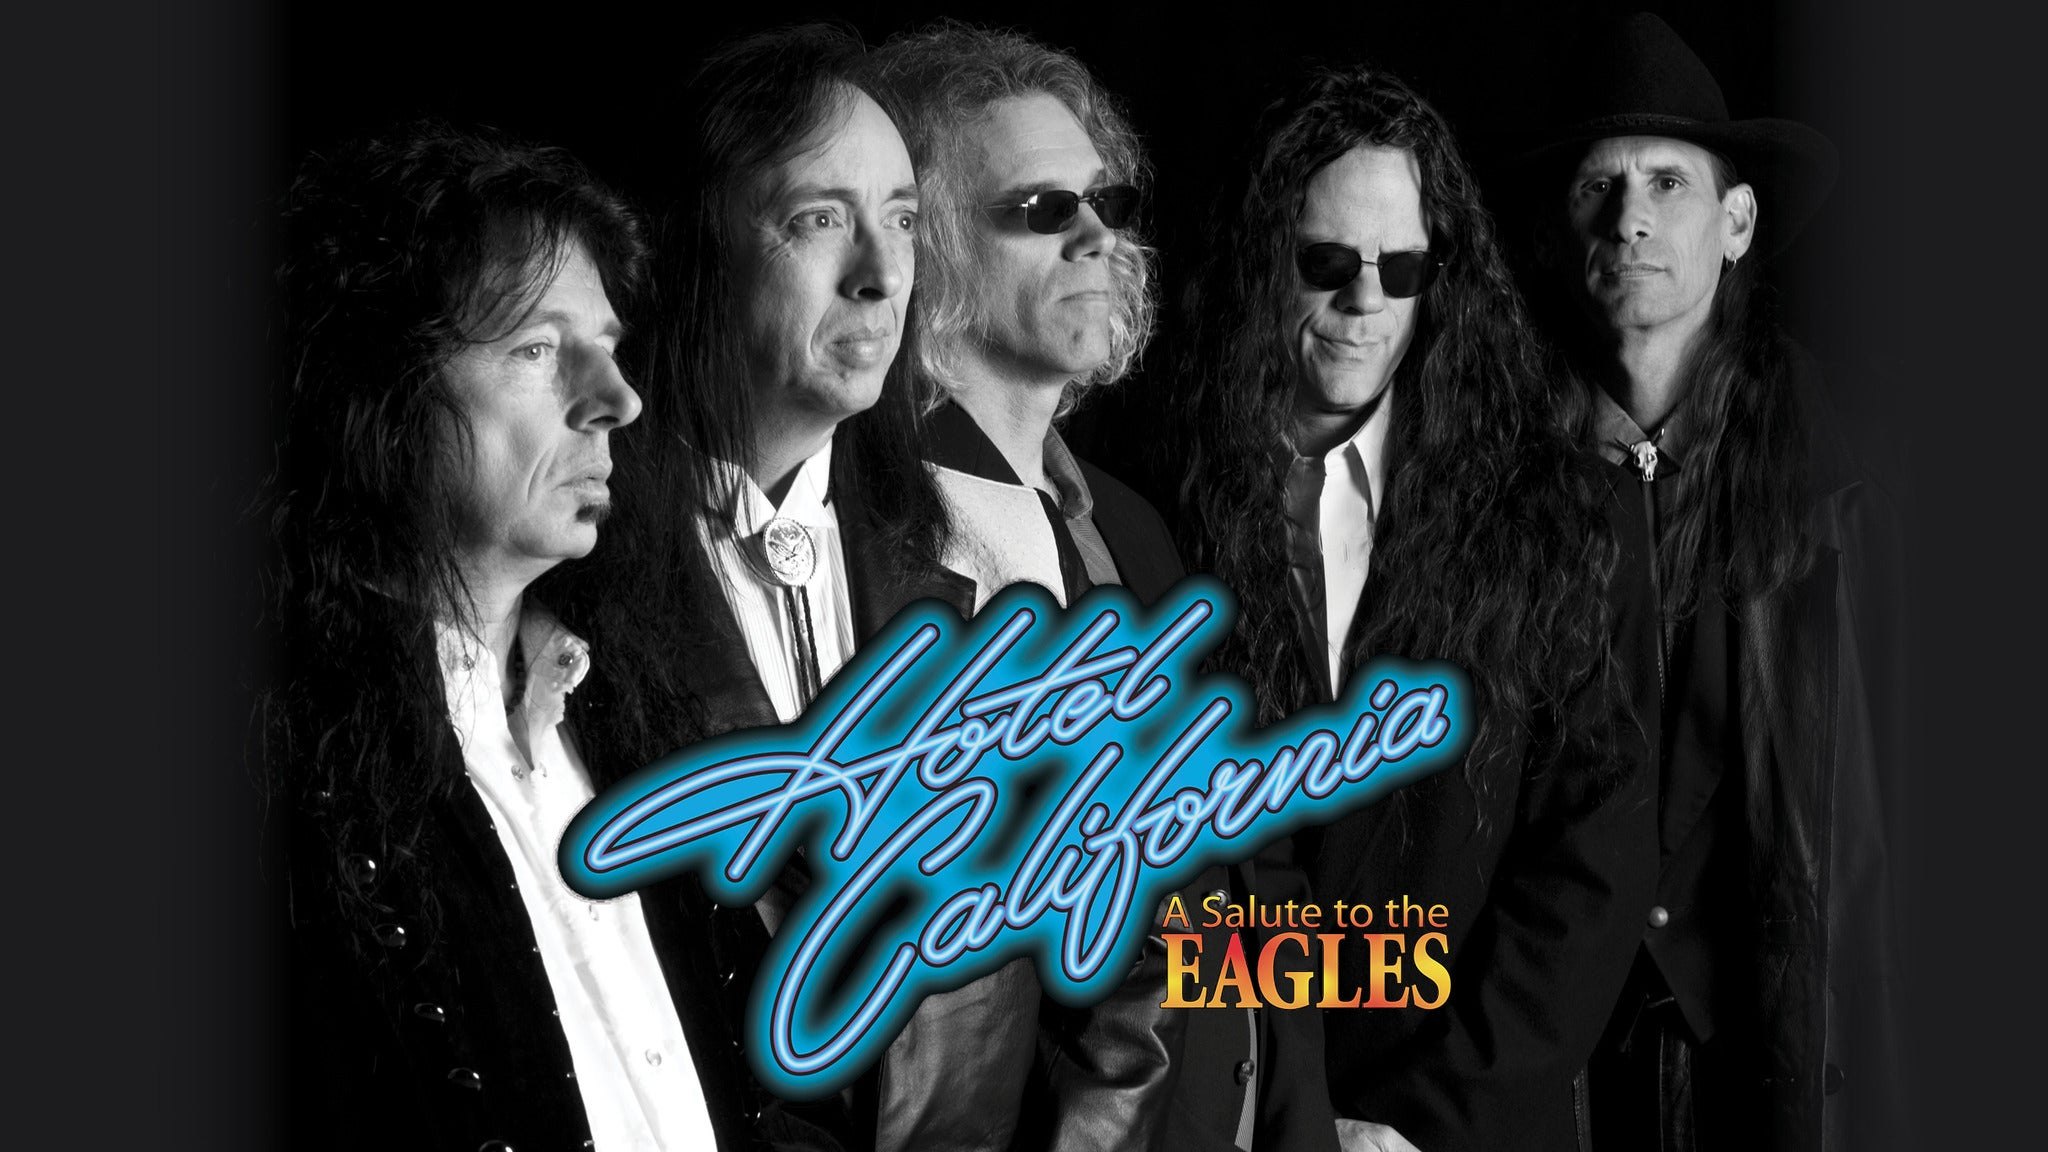 Hotel California - A Salute to The Eagles